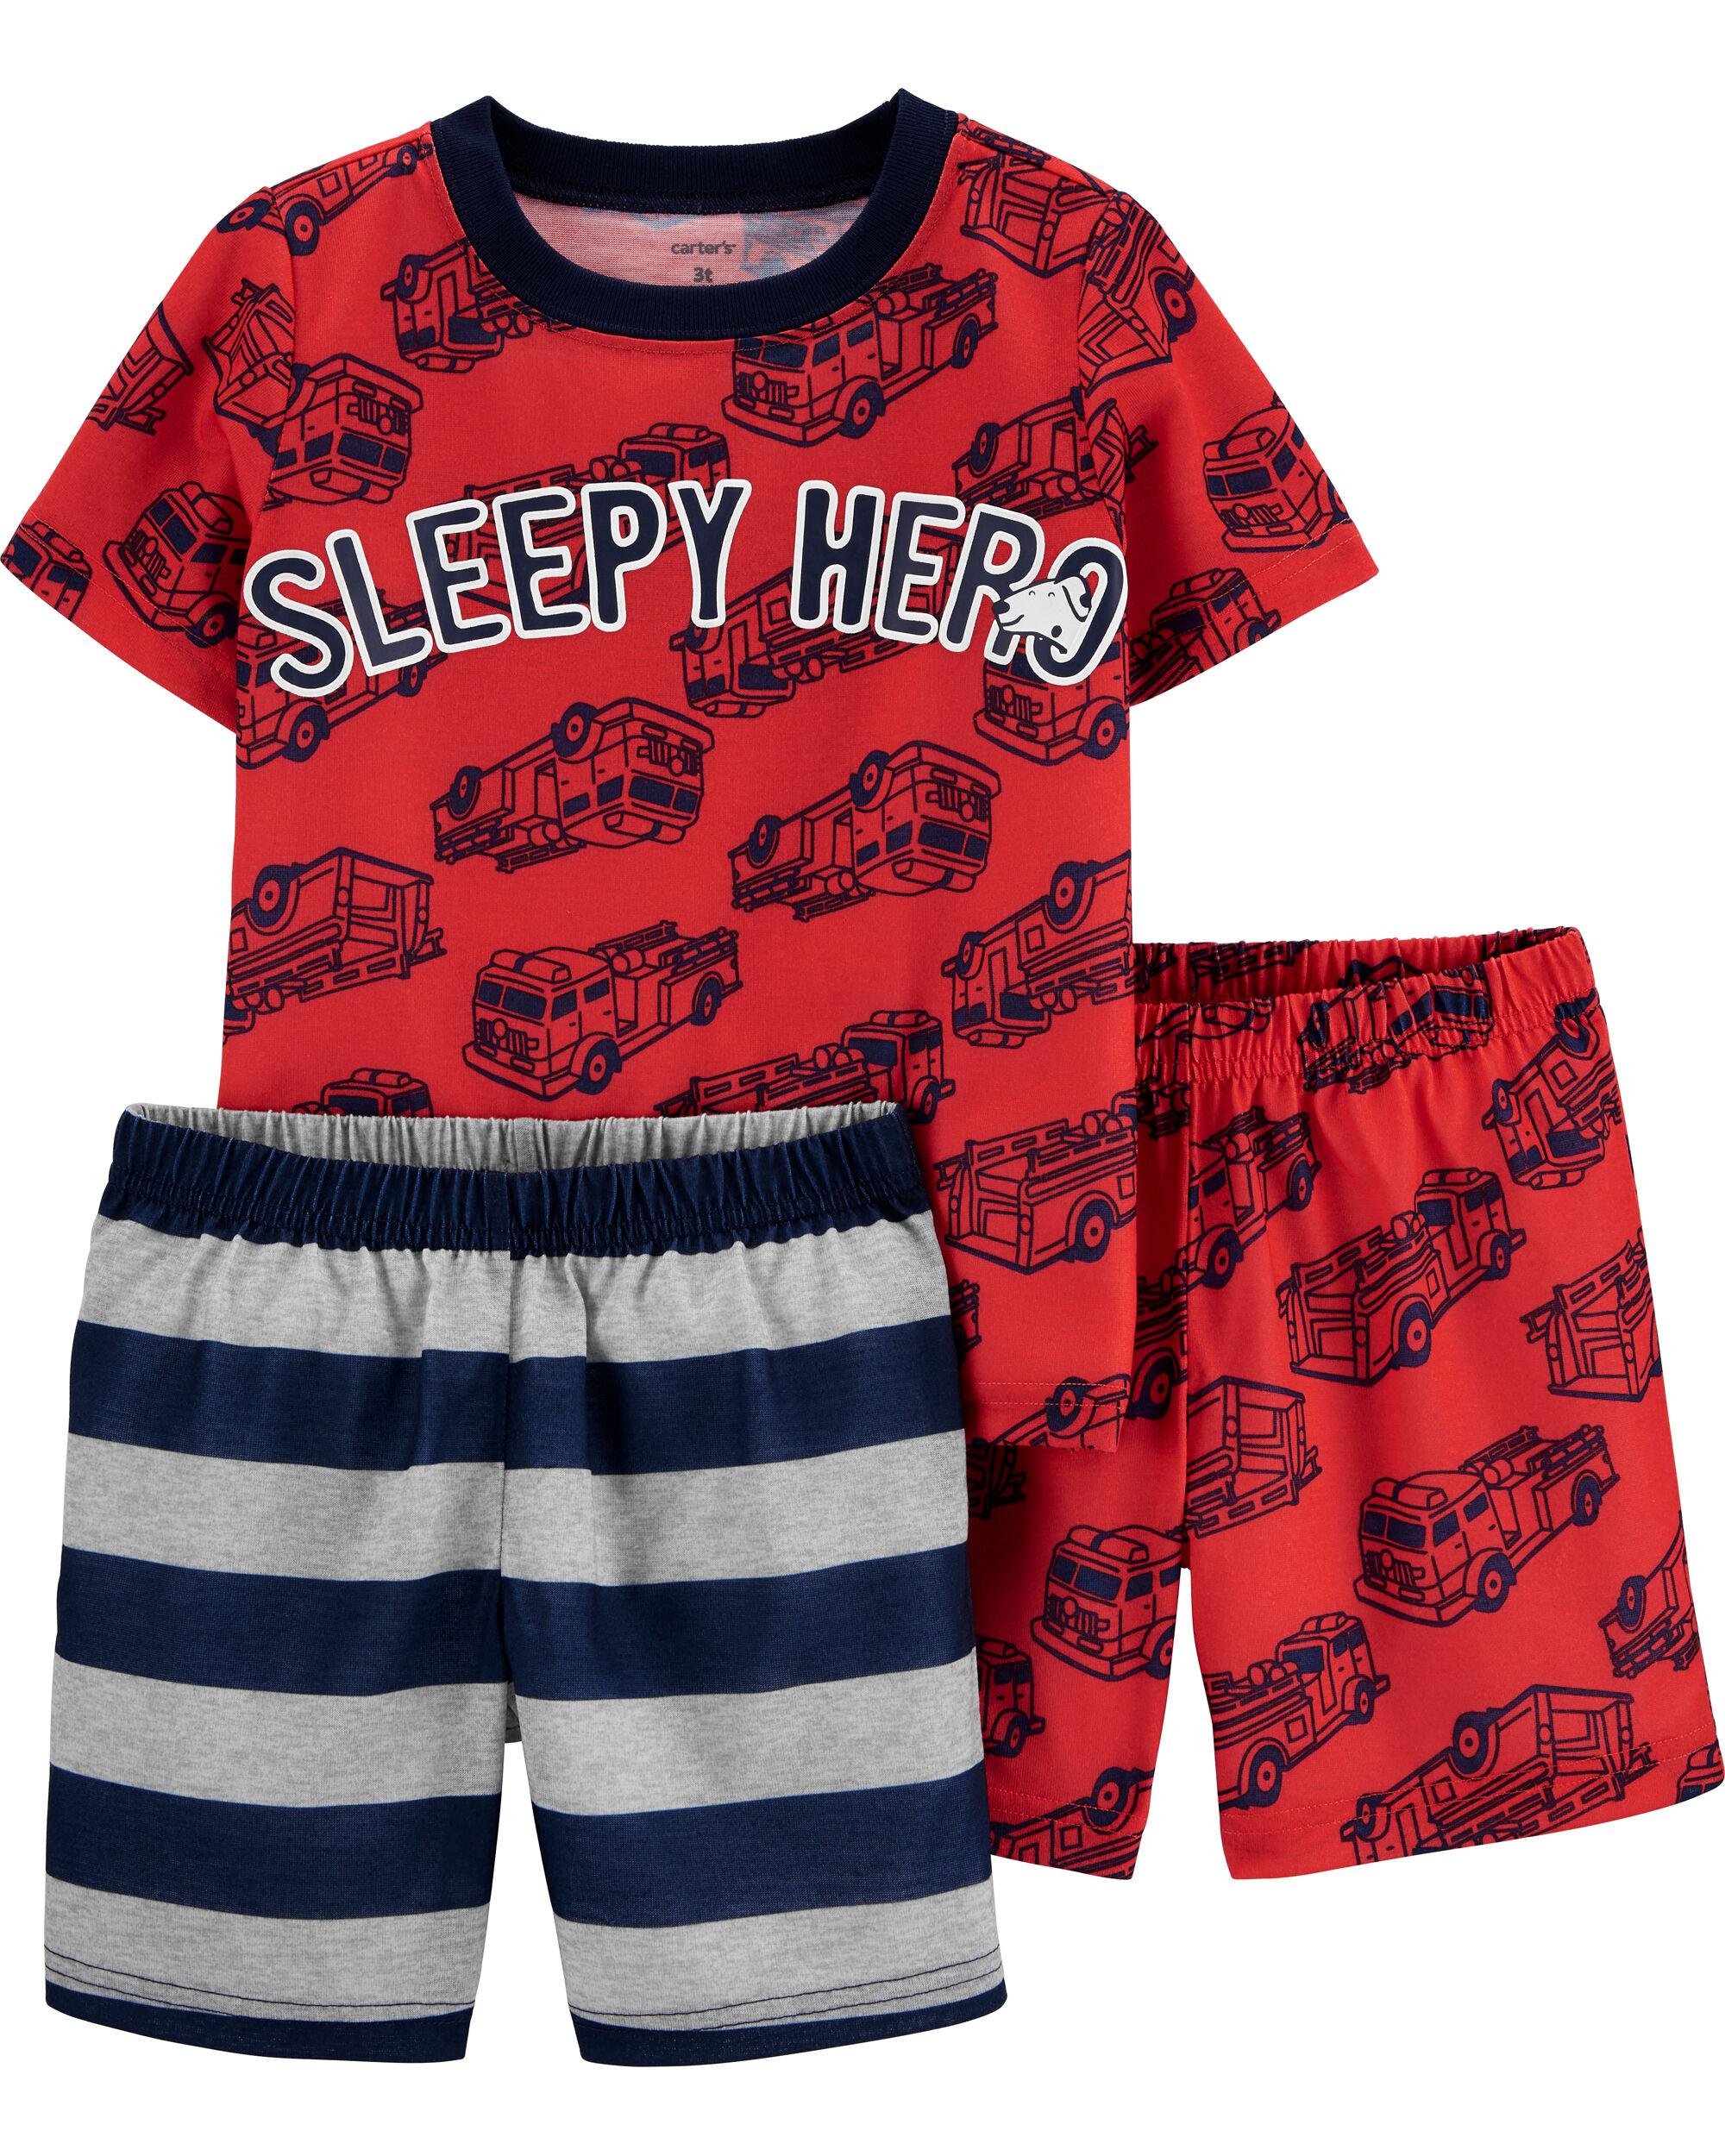 3T Available Holiday Boys Stripe Set Pajamas NWT 2T